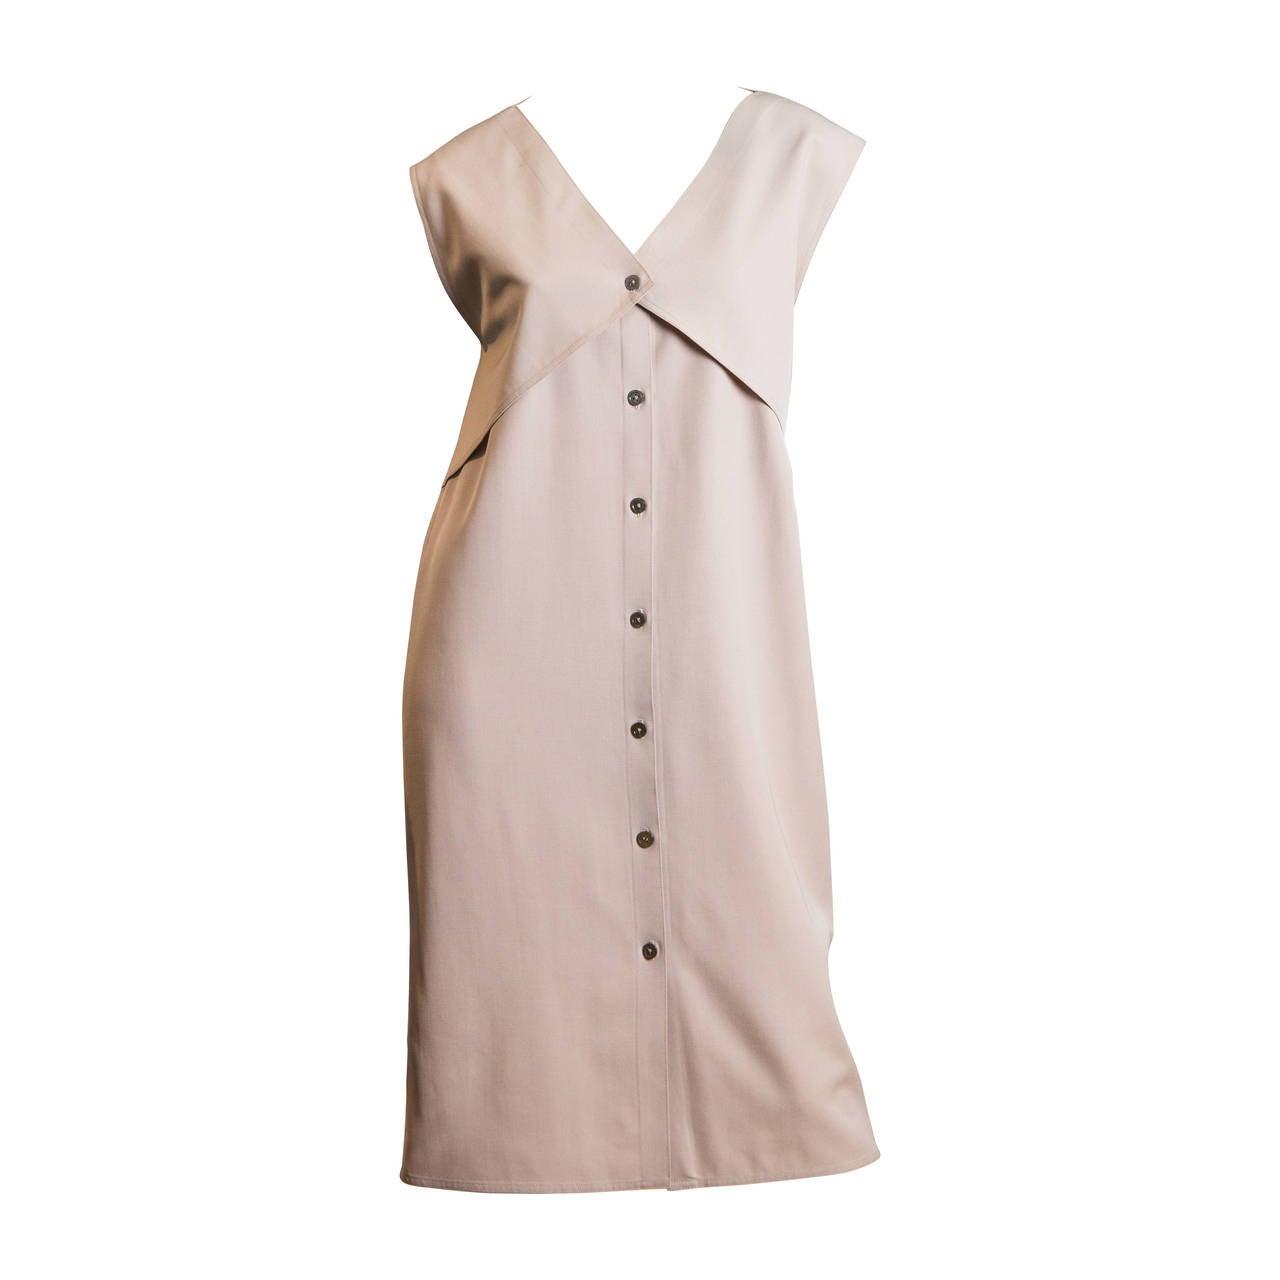 Minimalist Geoffrey Beene Dress